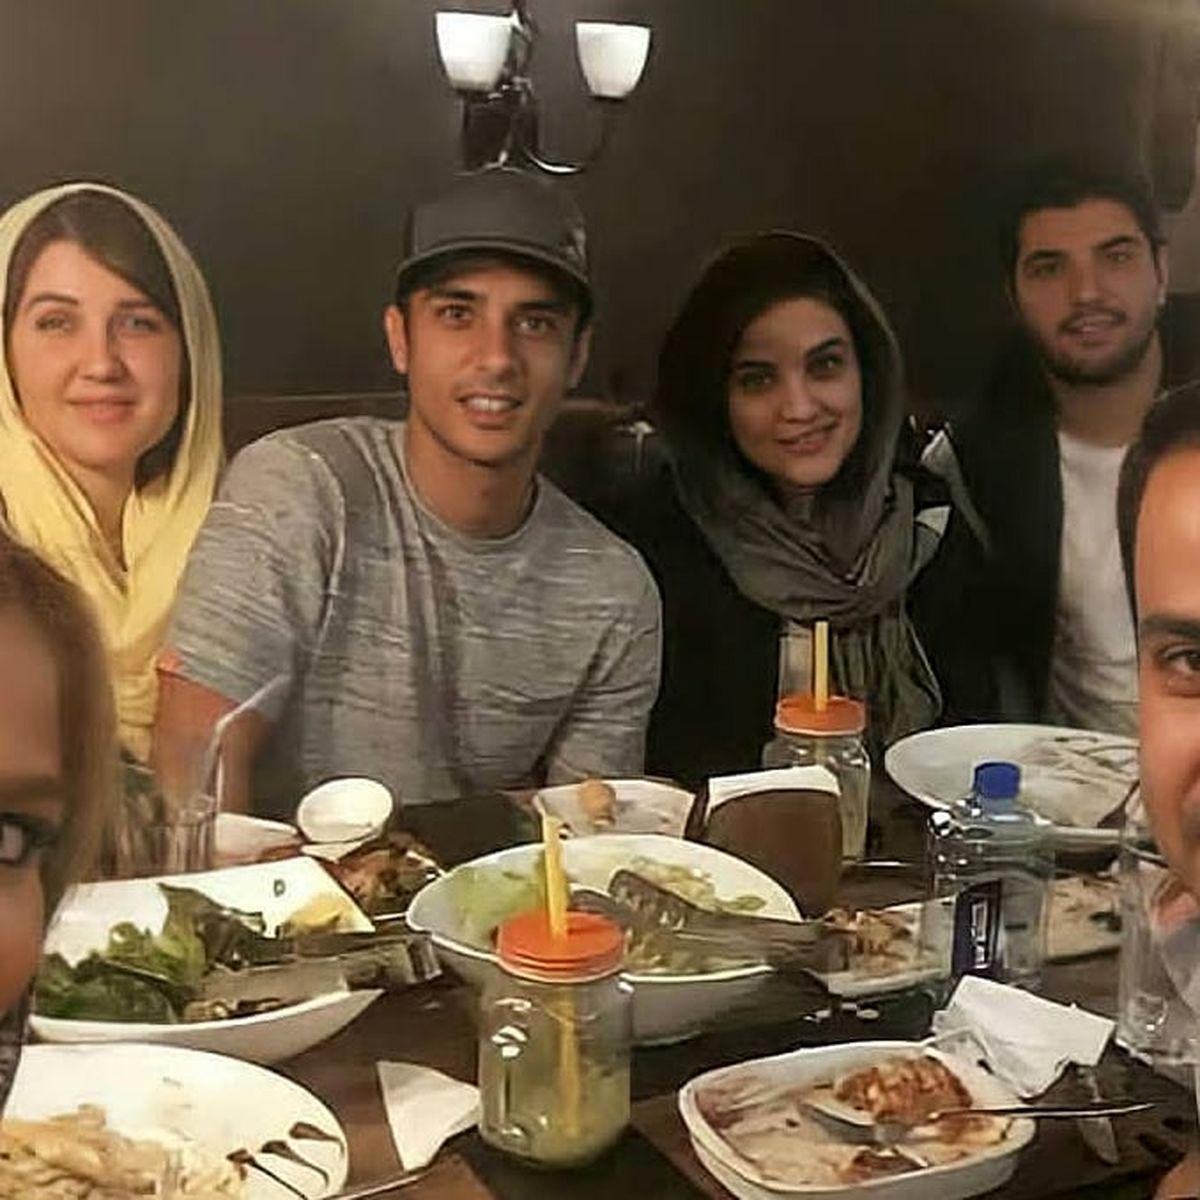 رستورانِ لاکچری ساعد سهیلی و خانواده اش + عکس